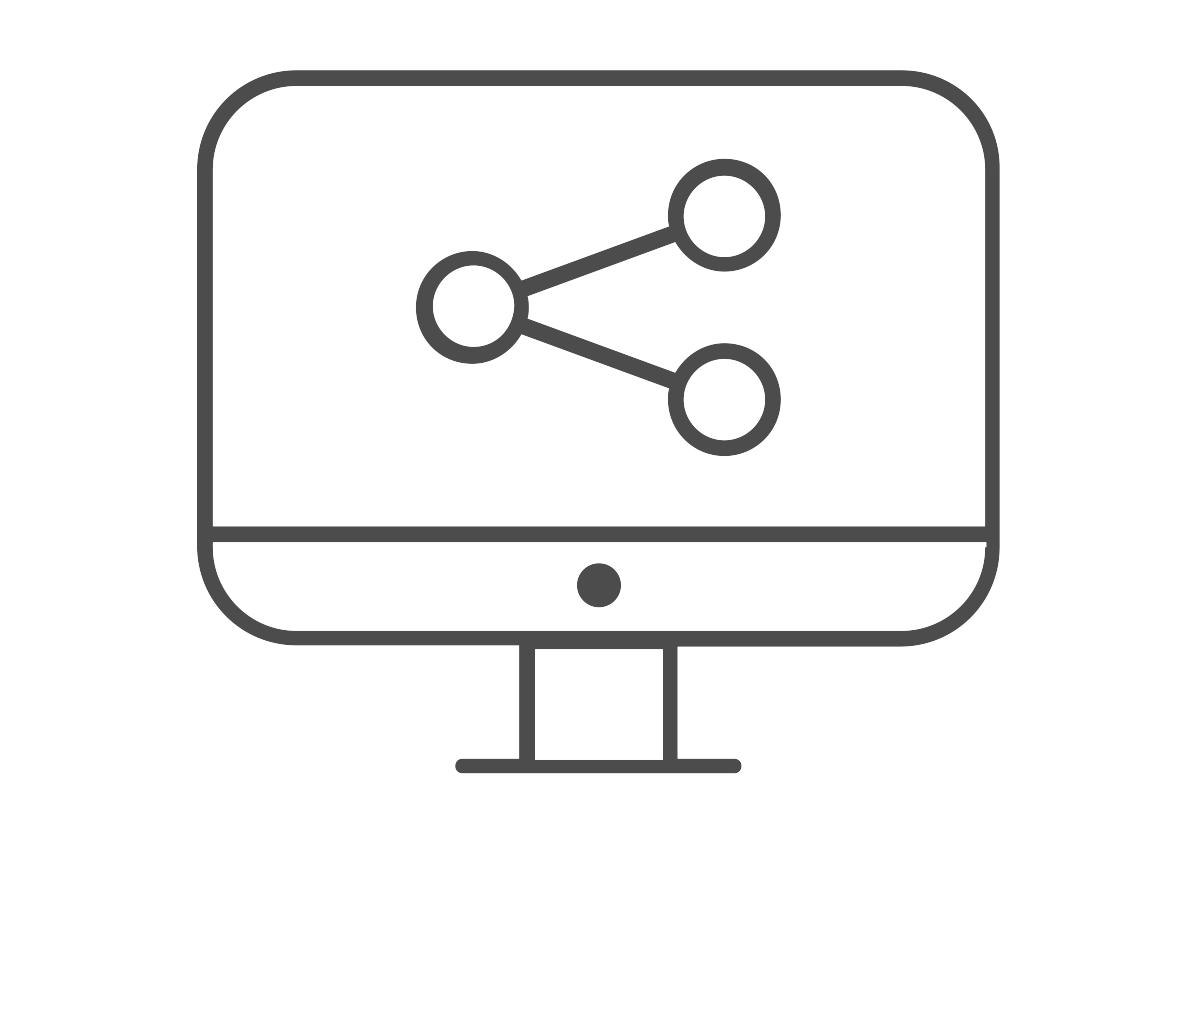 visual abstract icon